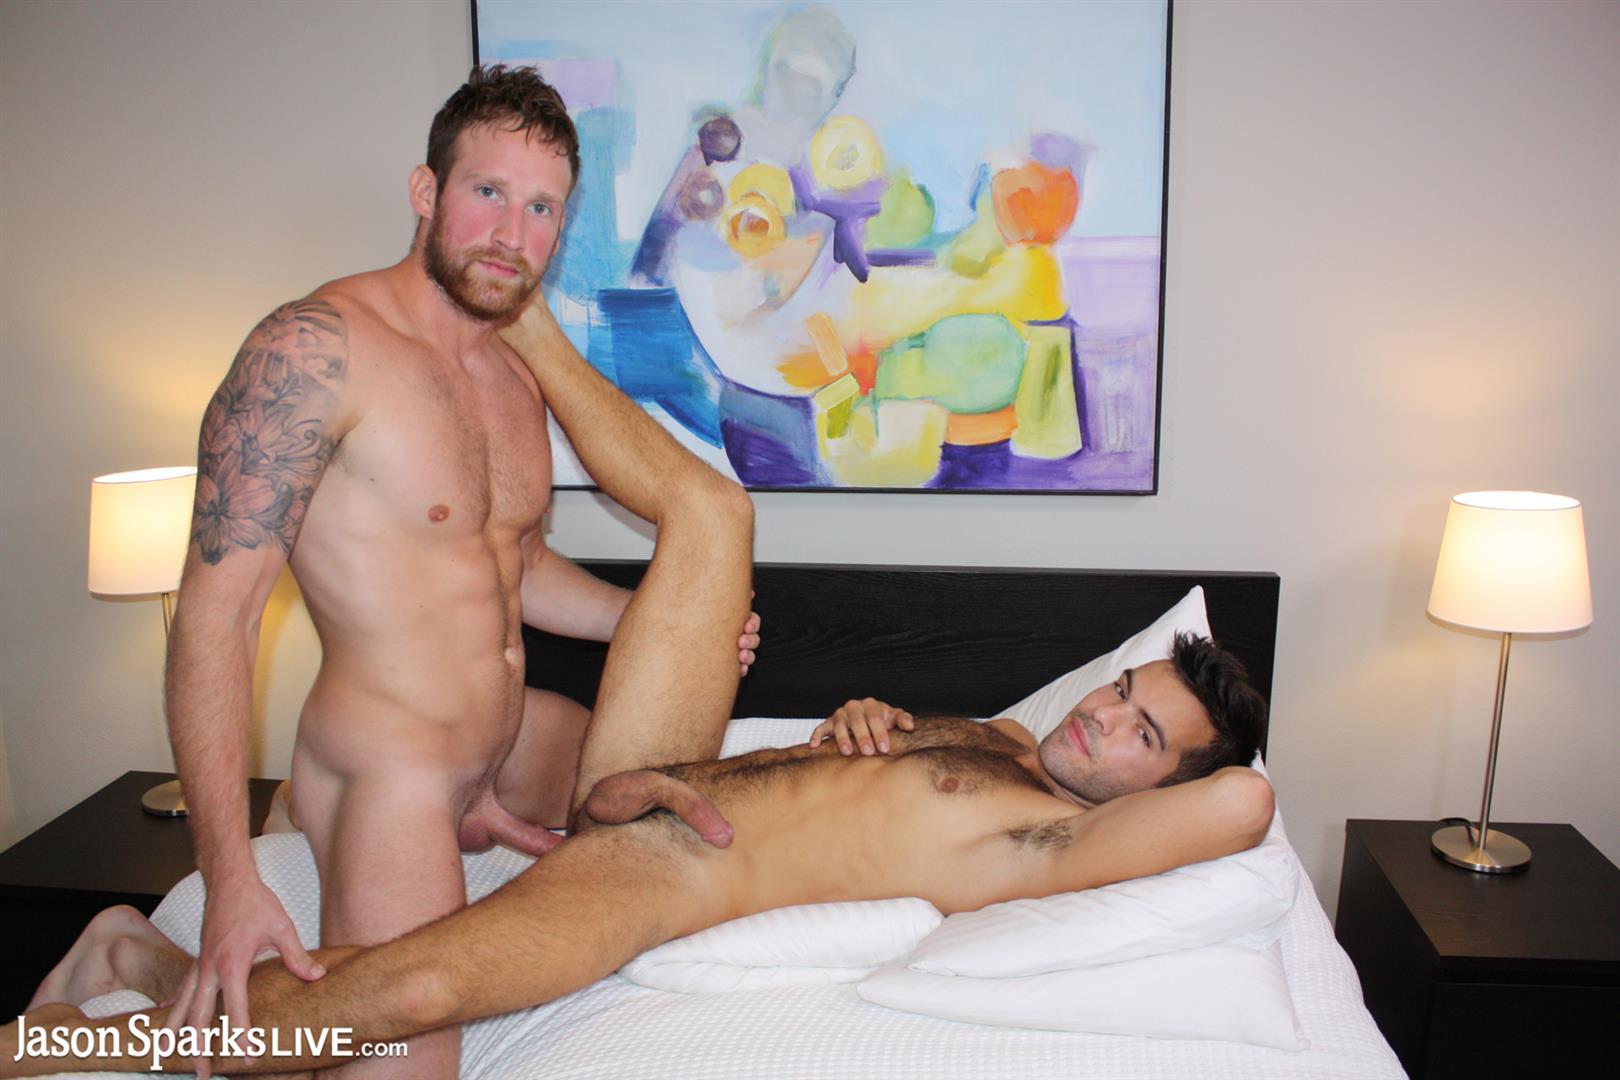 Jason-Sparks-Live-Logan-Carter-and-Riley-Ross-Bareback-Hotel-Sex-Video-15 Amateur Barebacking Tour Stops In Atlanta For Some Big Dick